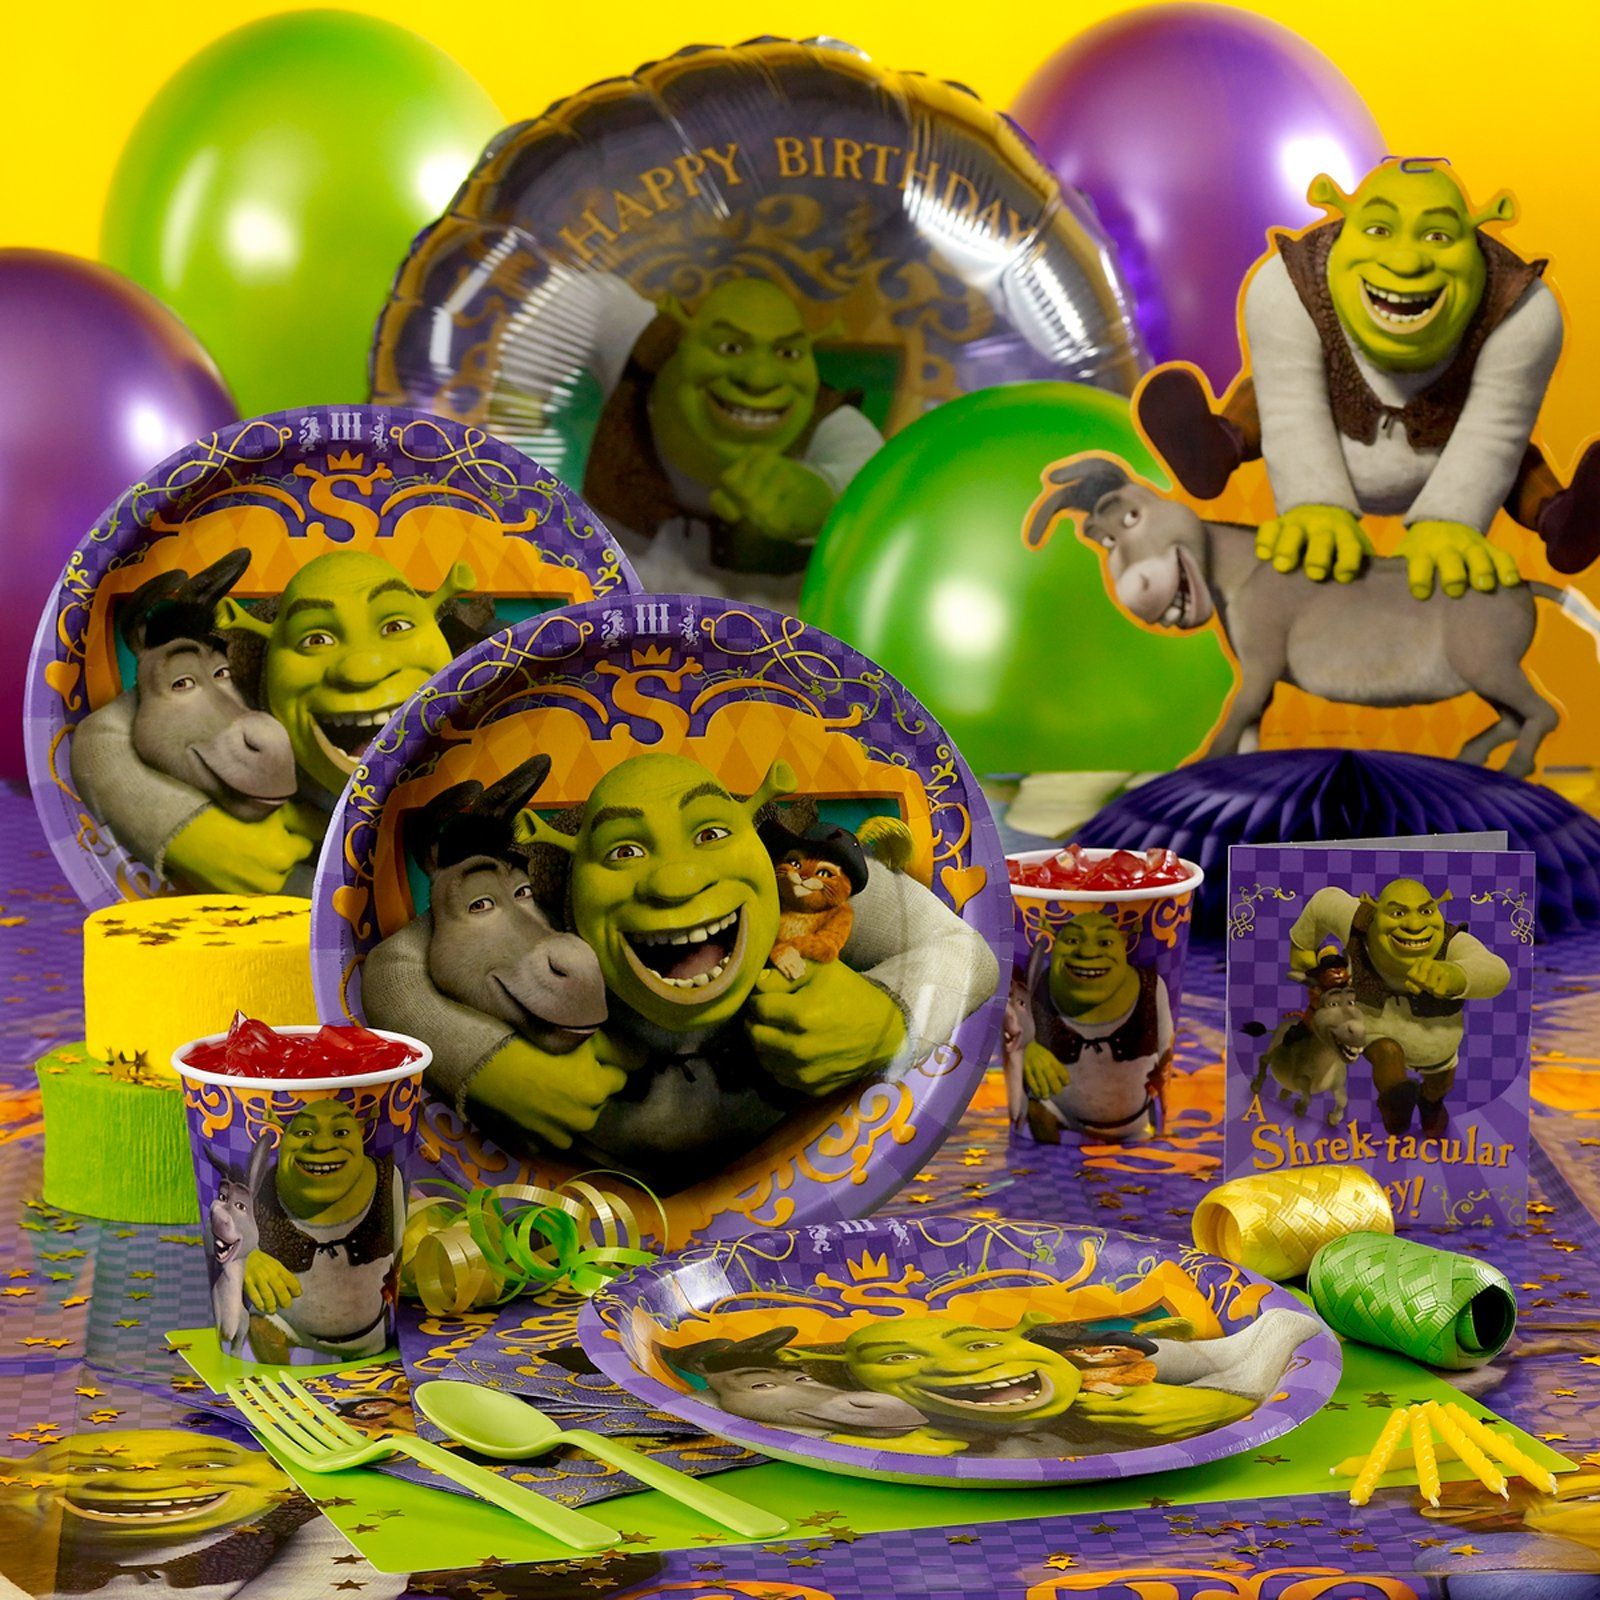 How To Train Your Dragon 2 Foil Balloon Shrek